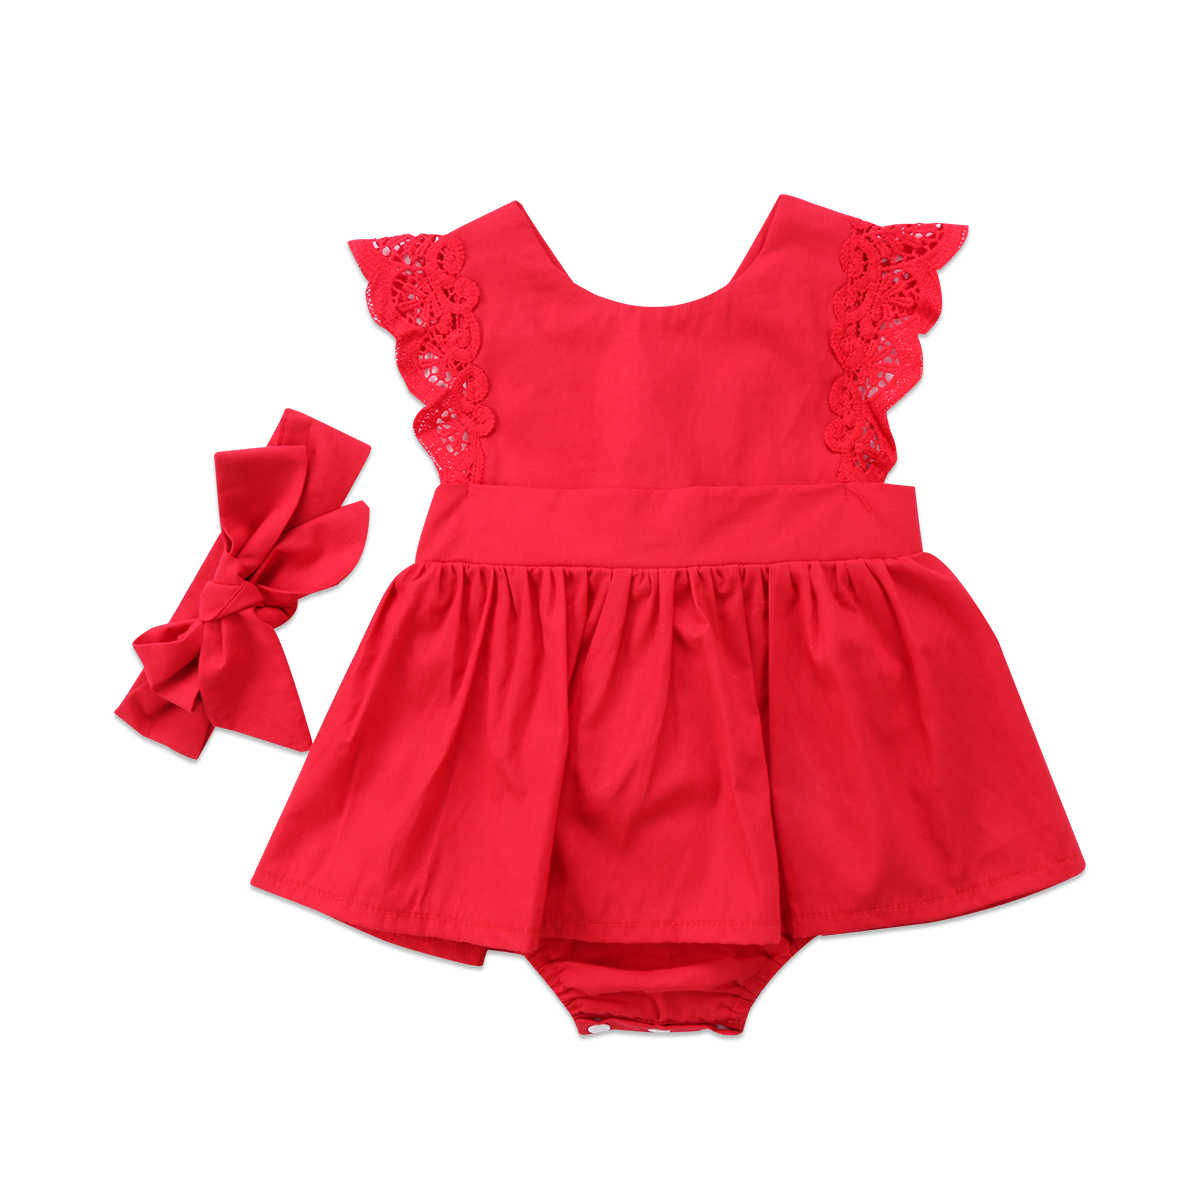 ad61a320753 2pcs Red Flower Cute Newborn Baby Girls Bodysuit Tutu Dress Jumpsuit Hole  Outfits Headband Set Clothes